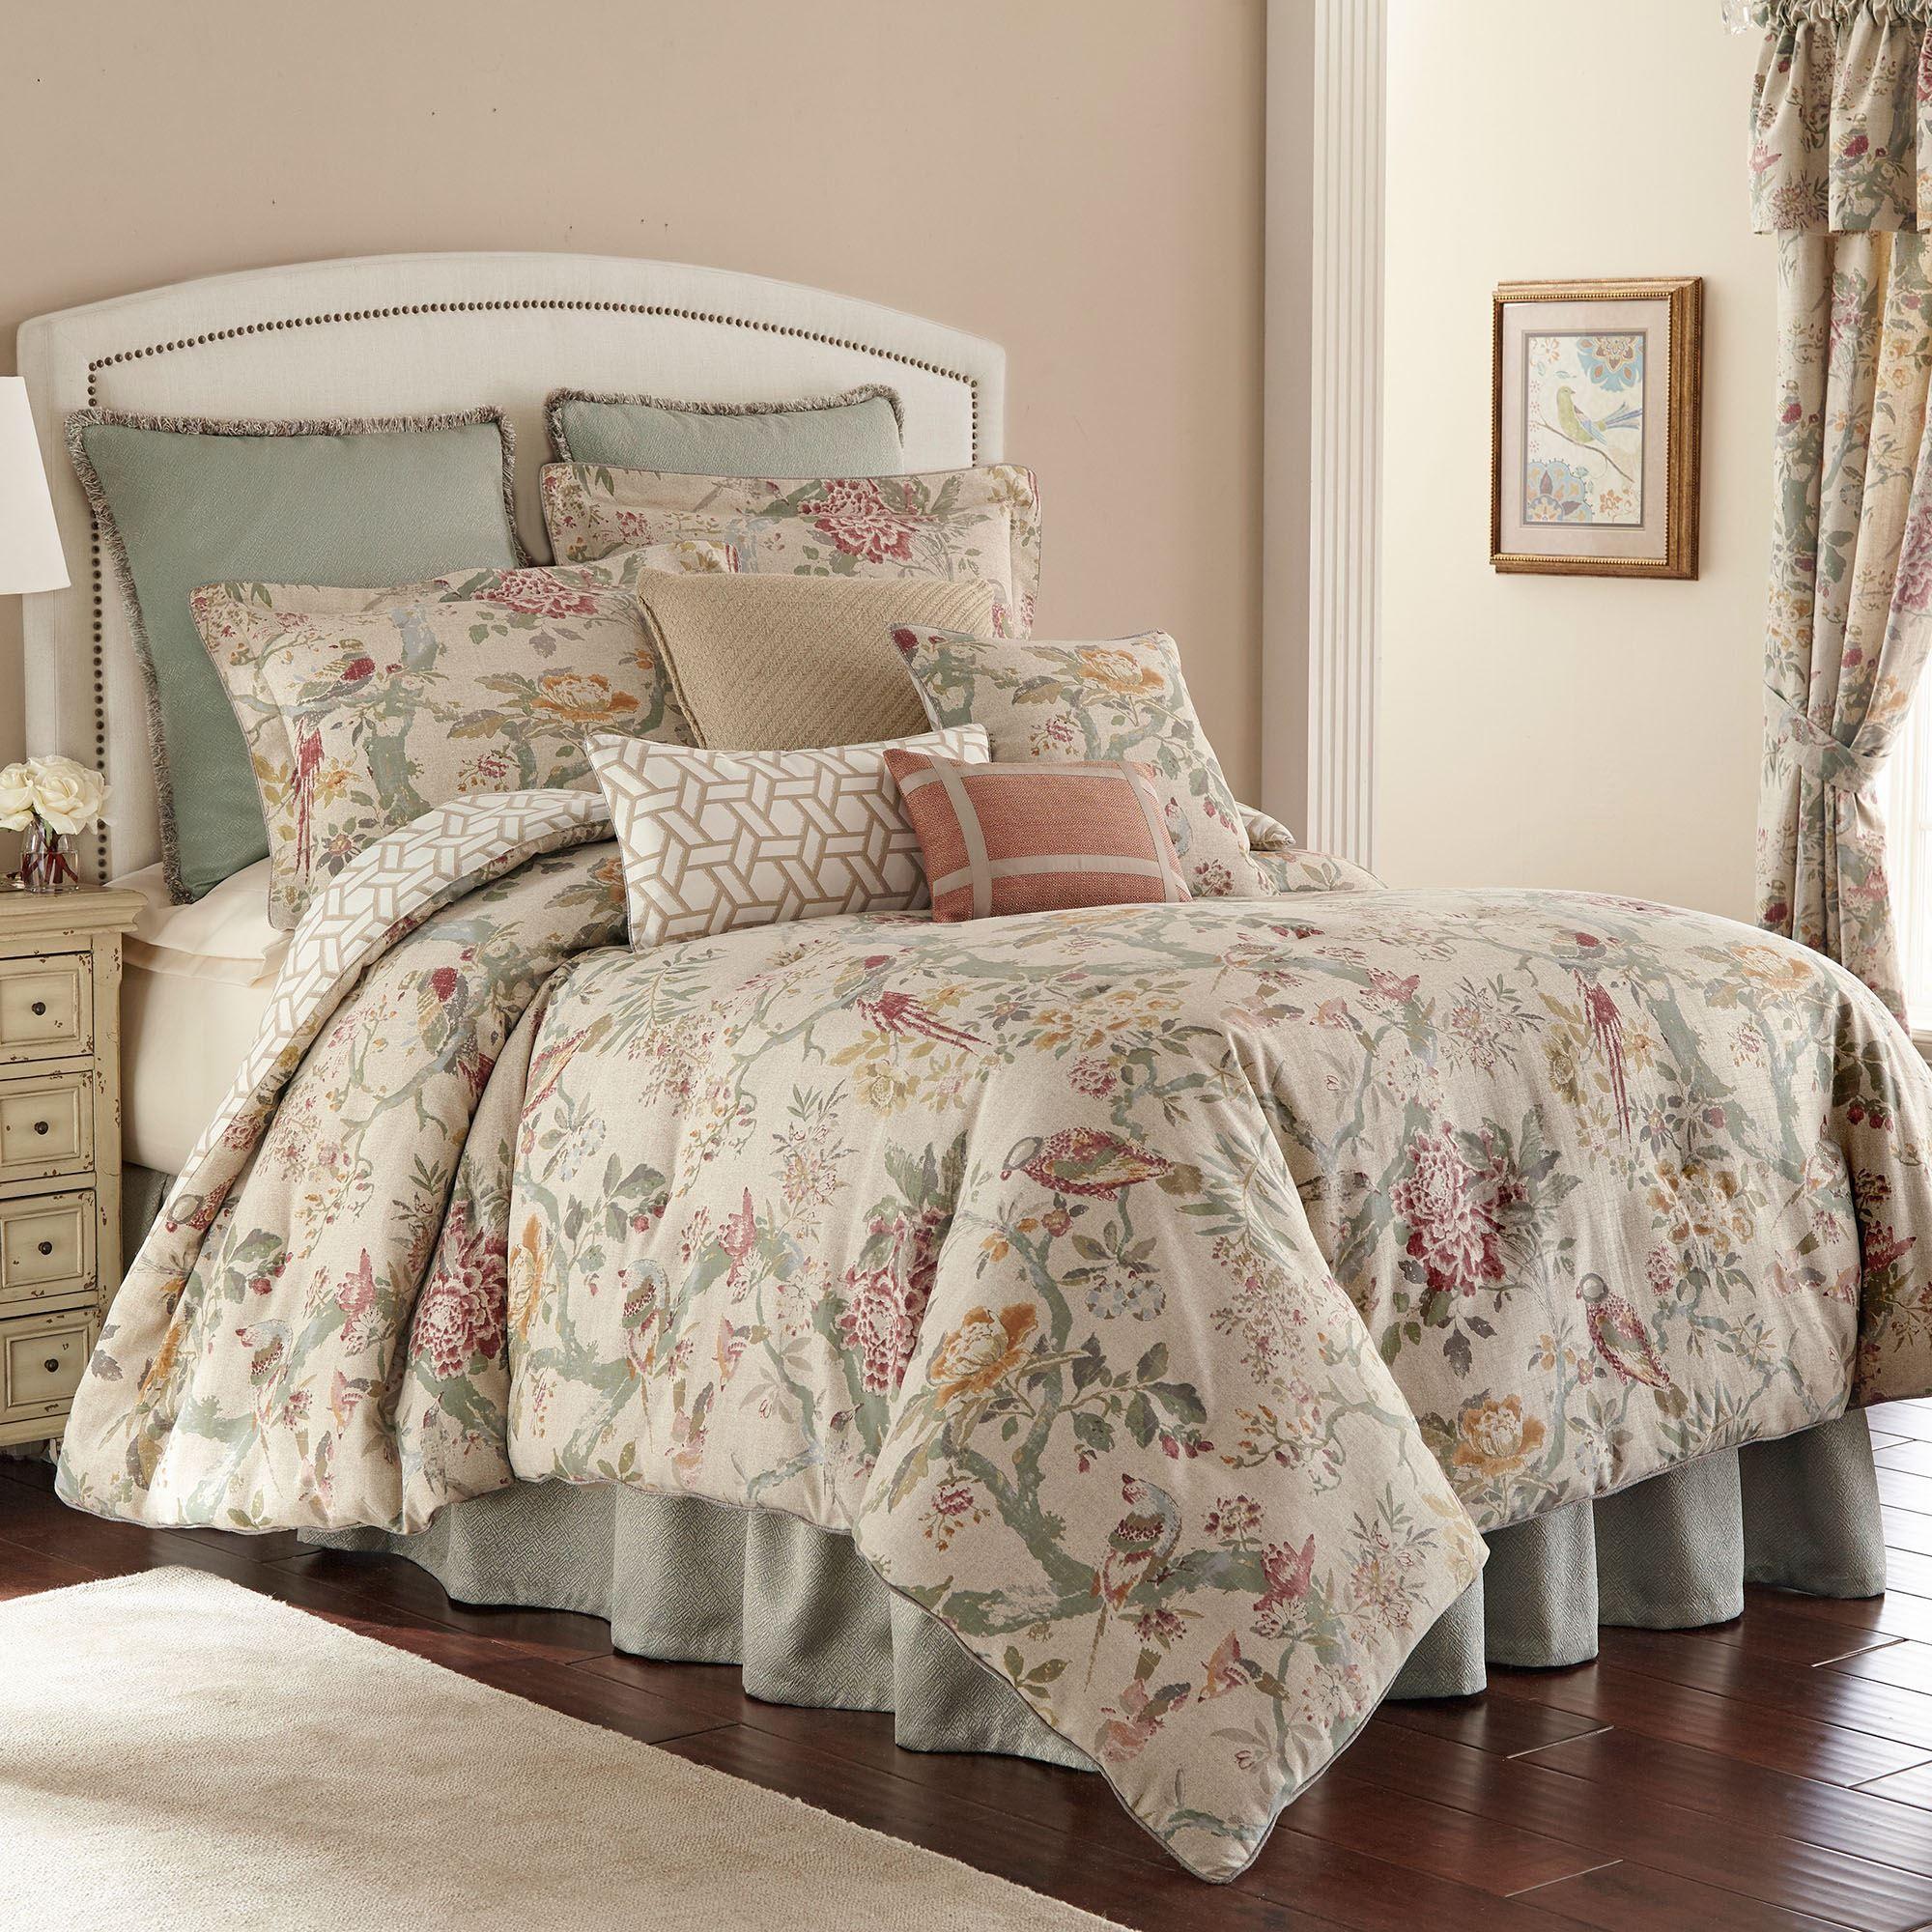 Bicarri Vintage Style Nature Floral Comforter Bedding By